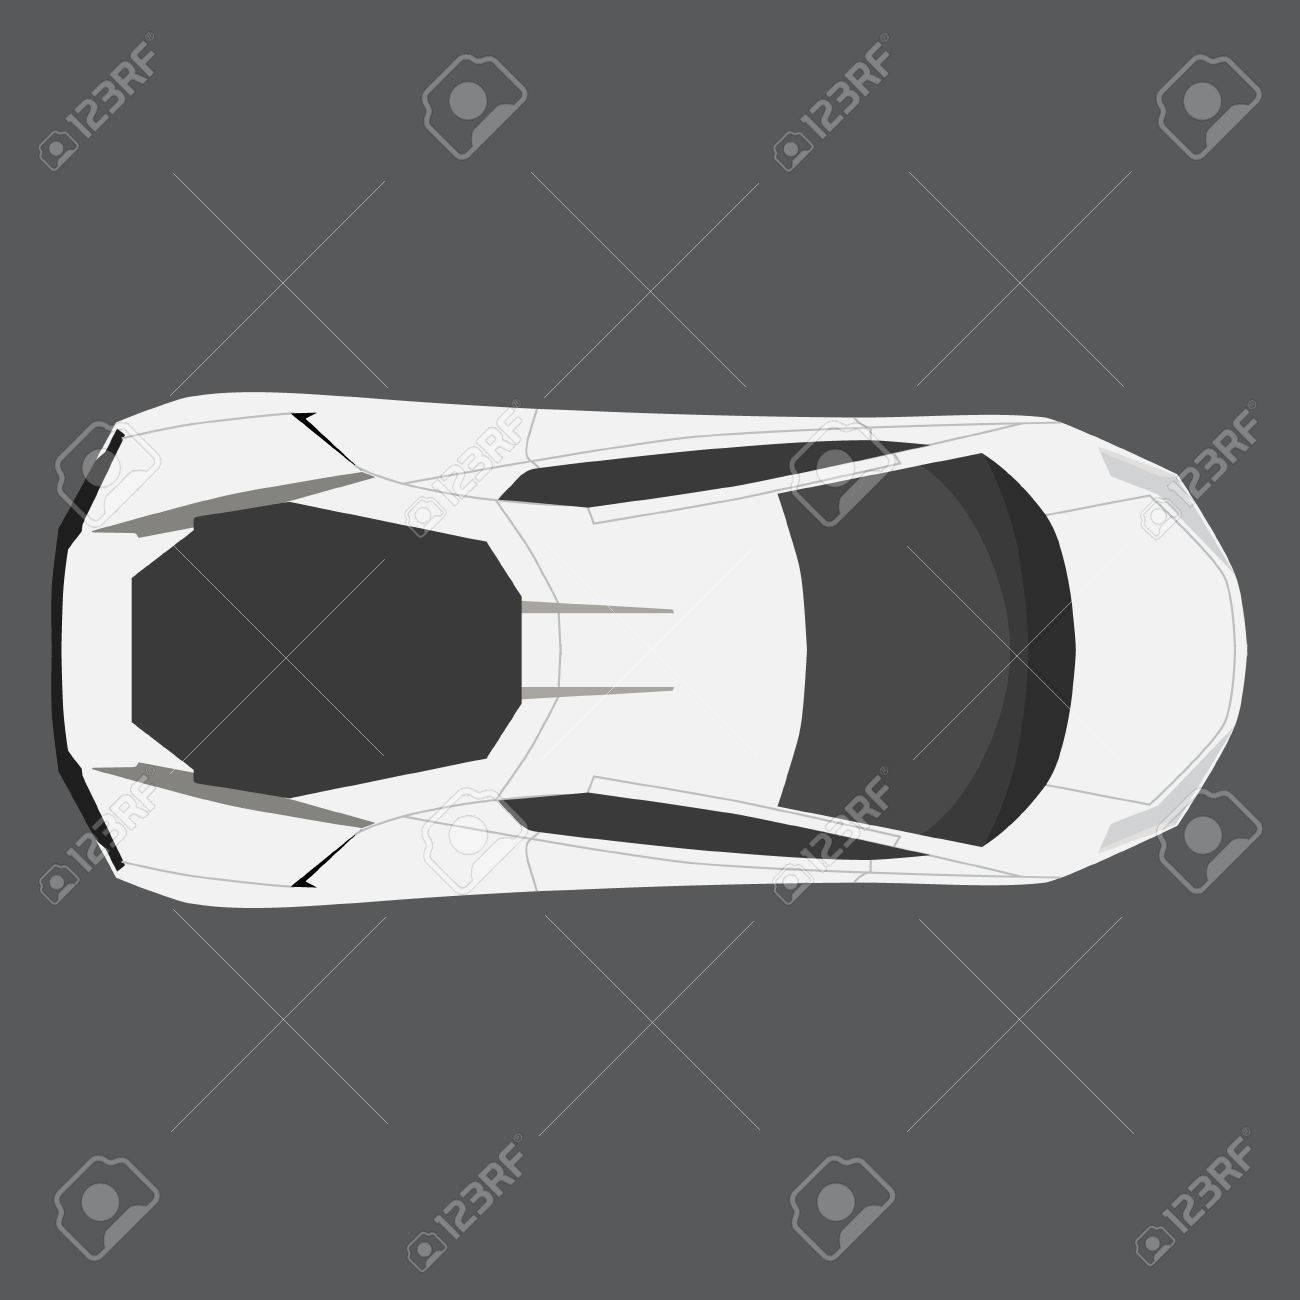 Vector Illustration White Car Top View Generic Car Sport Car